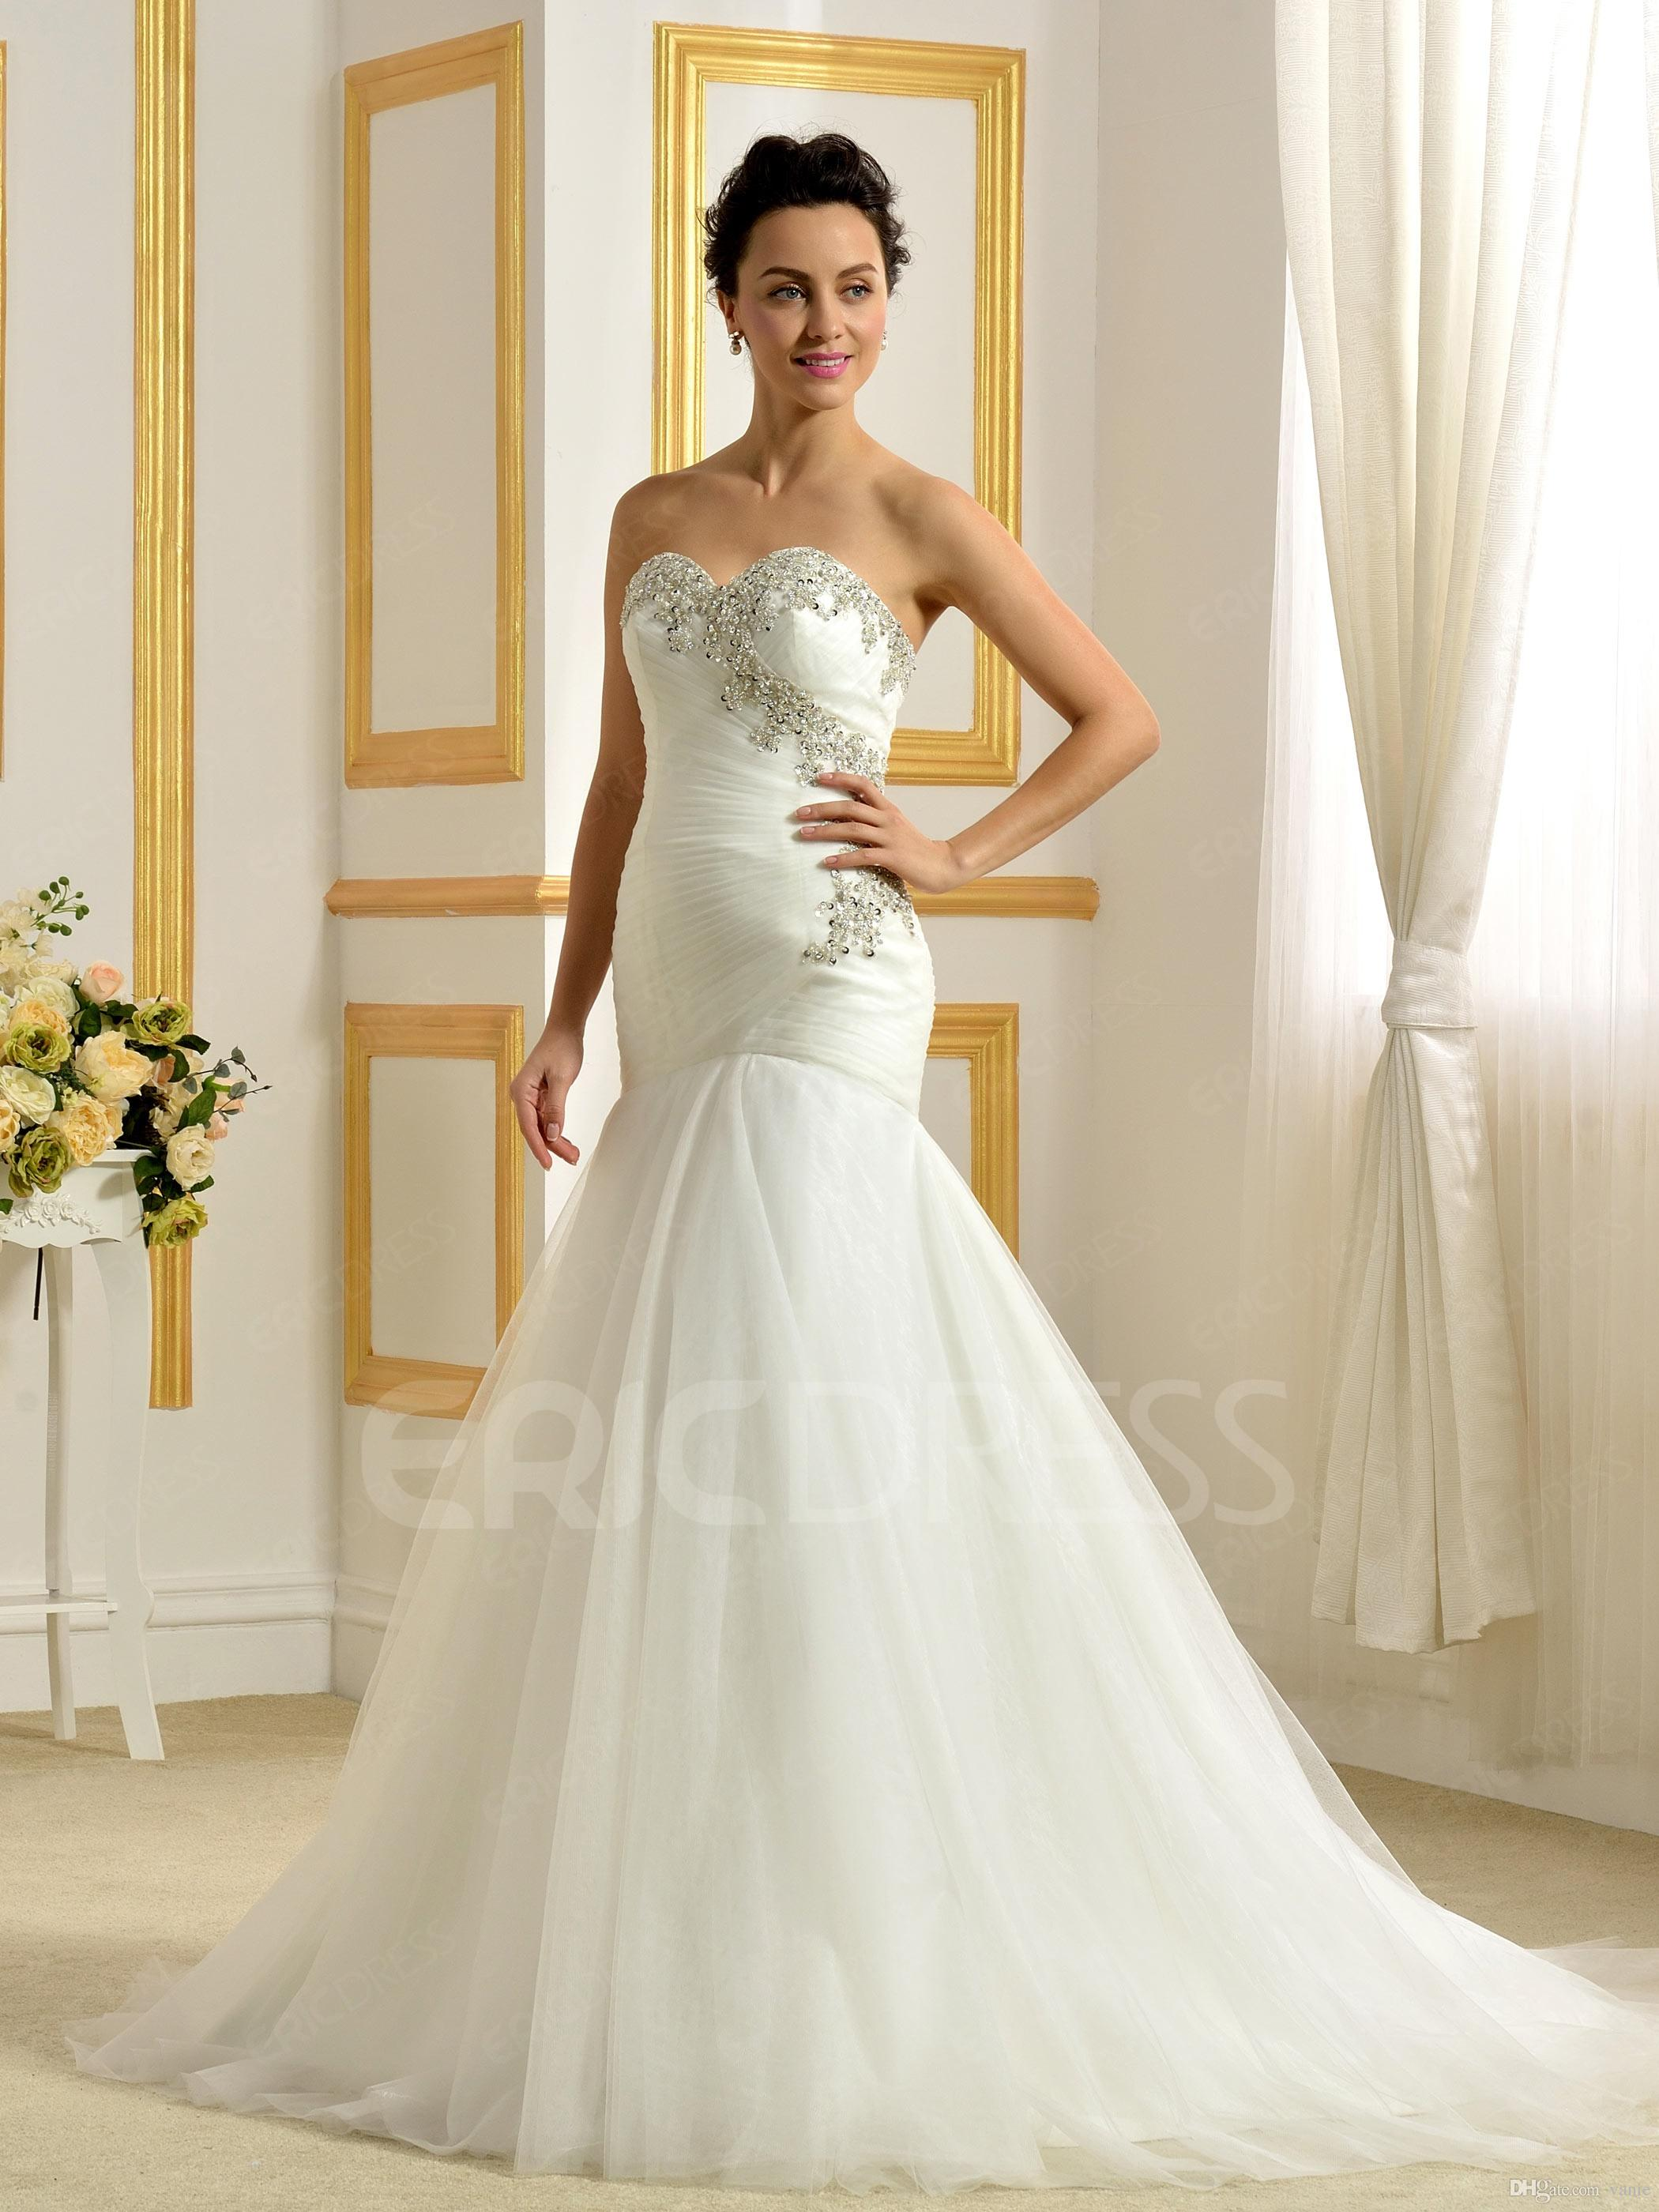 Fashionable bride dresses